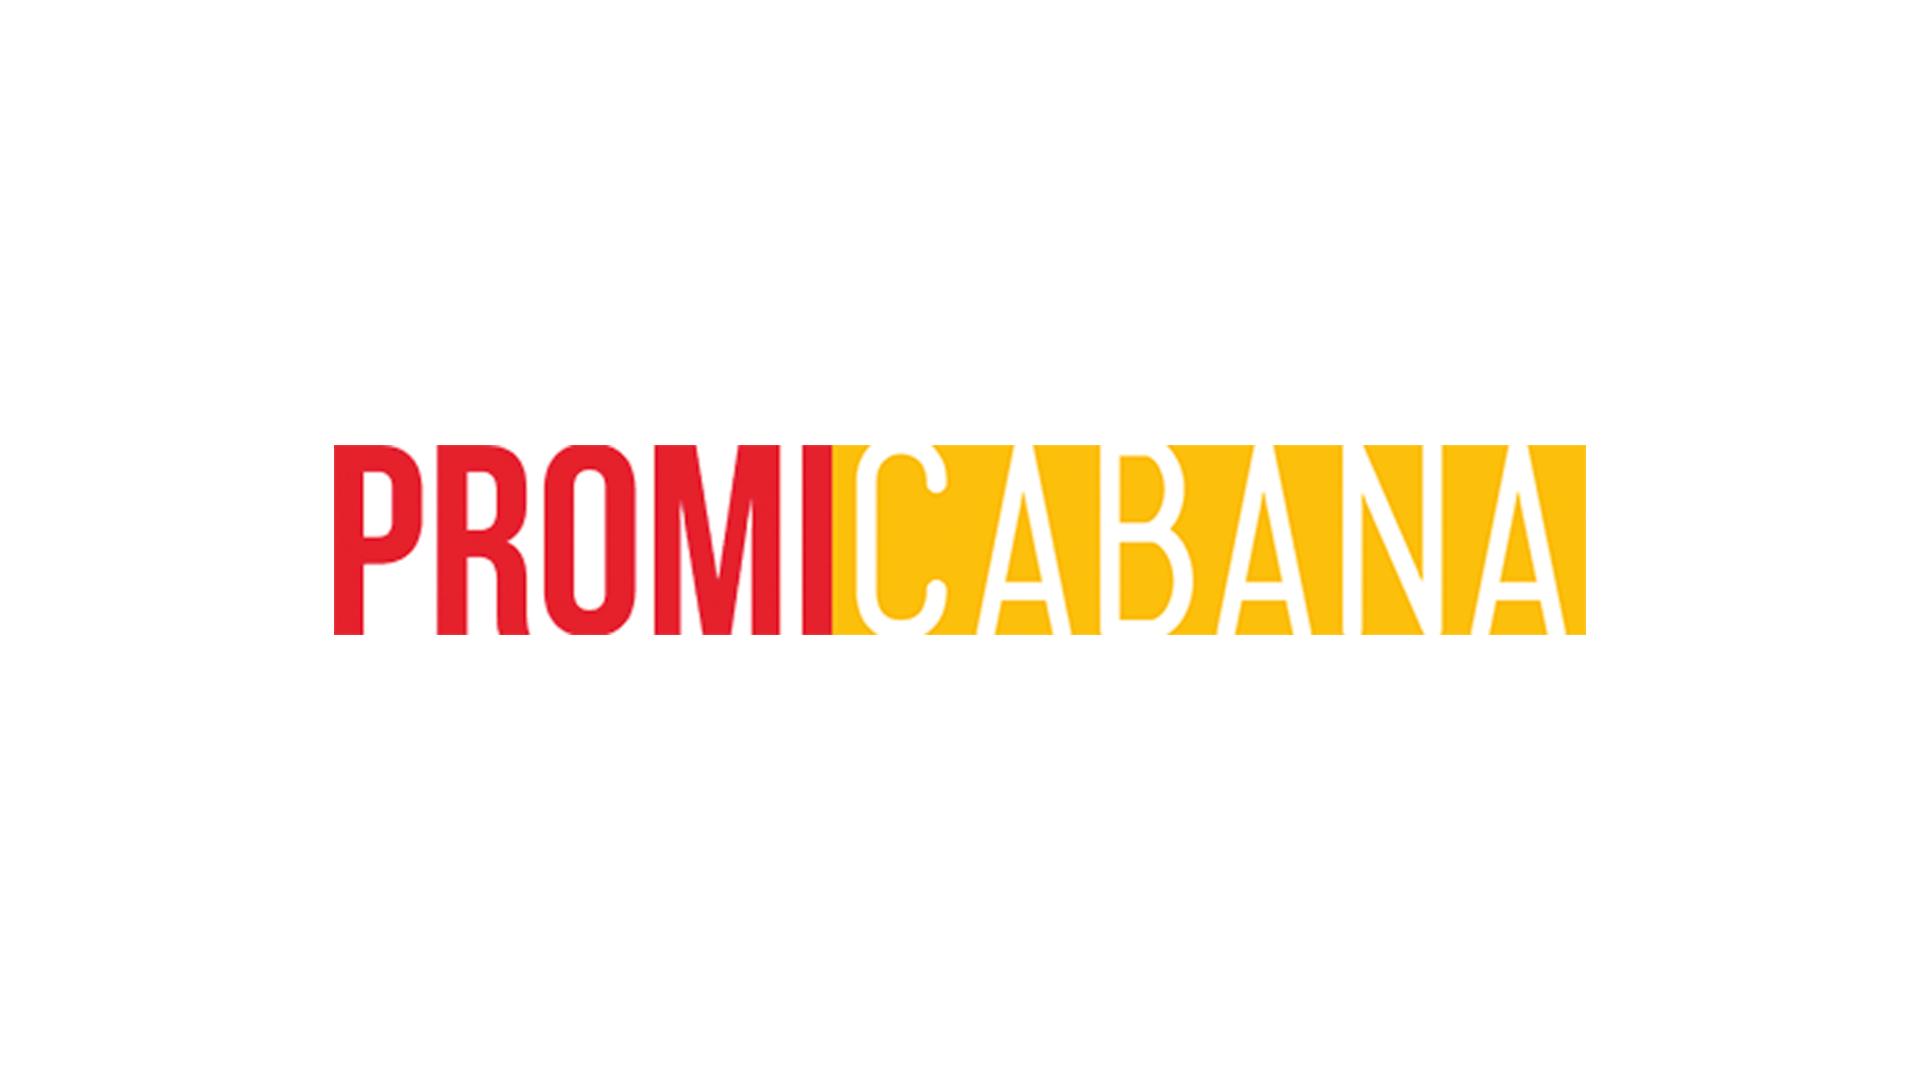 Justin-Bieber-Selena-Gomez-AMA-2011-2